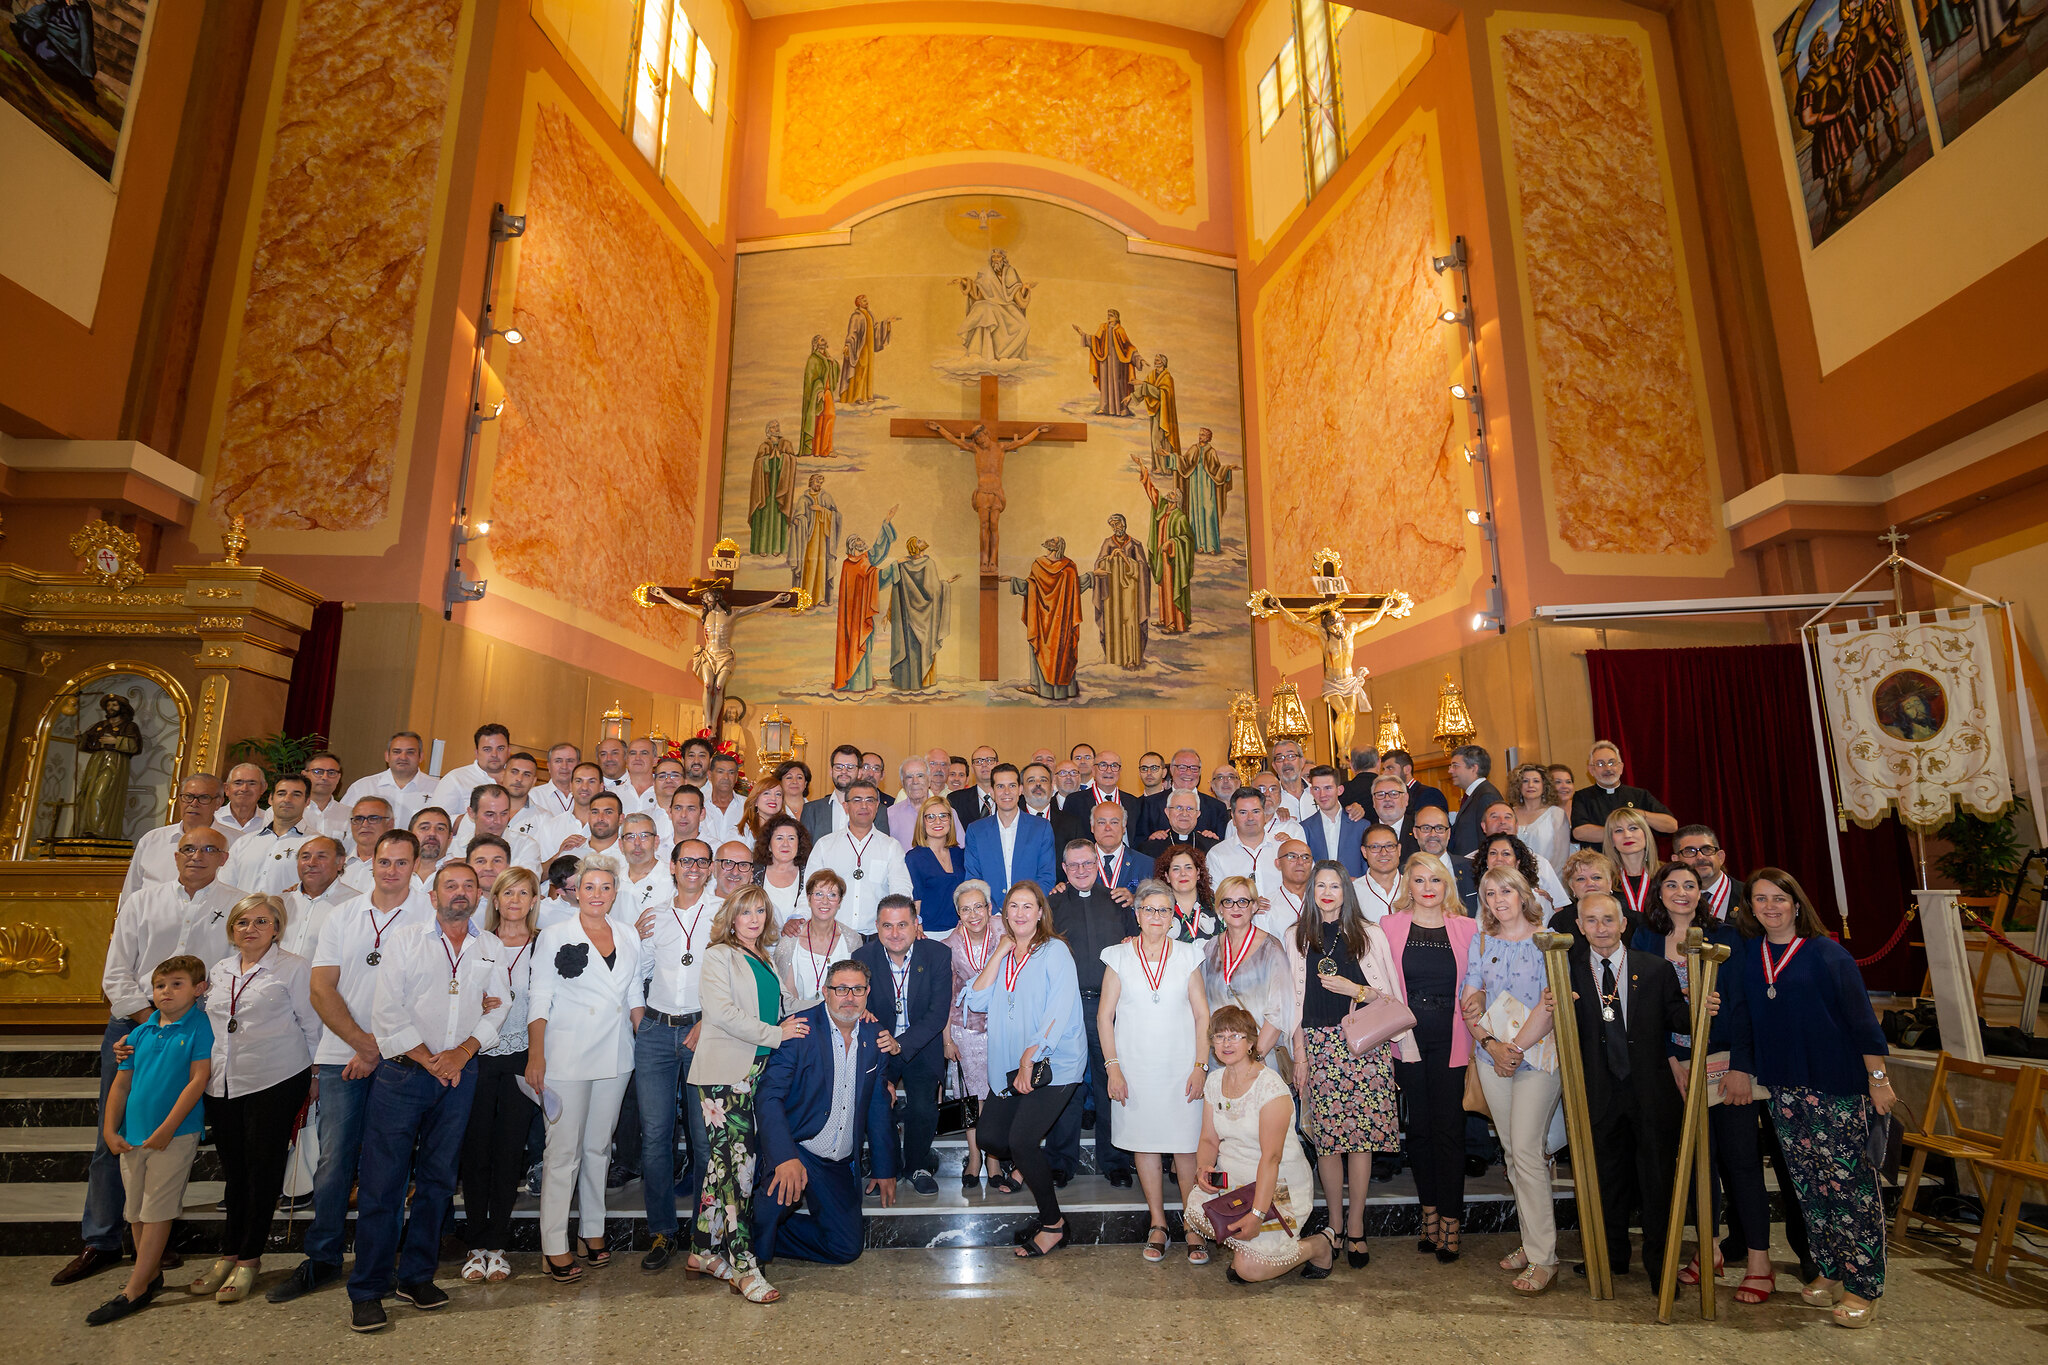 (2018-06-17) - 75 Aniversario - Encuentro - Vicent Olmos Navarro (27)